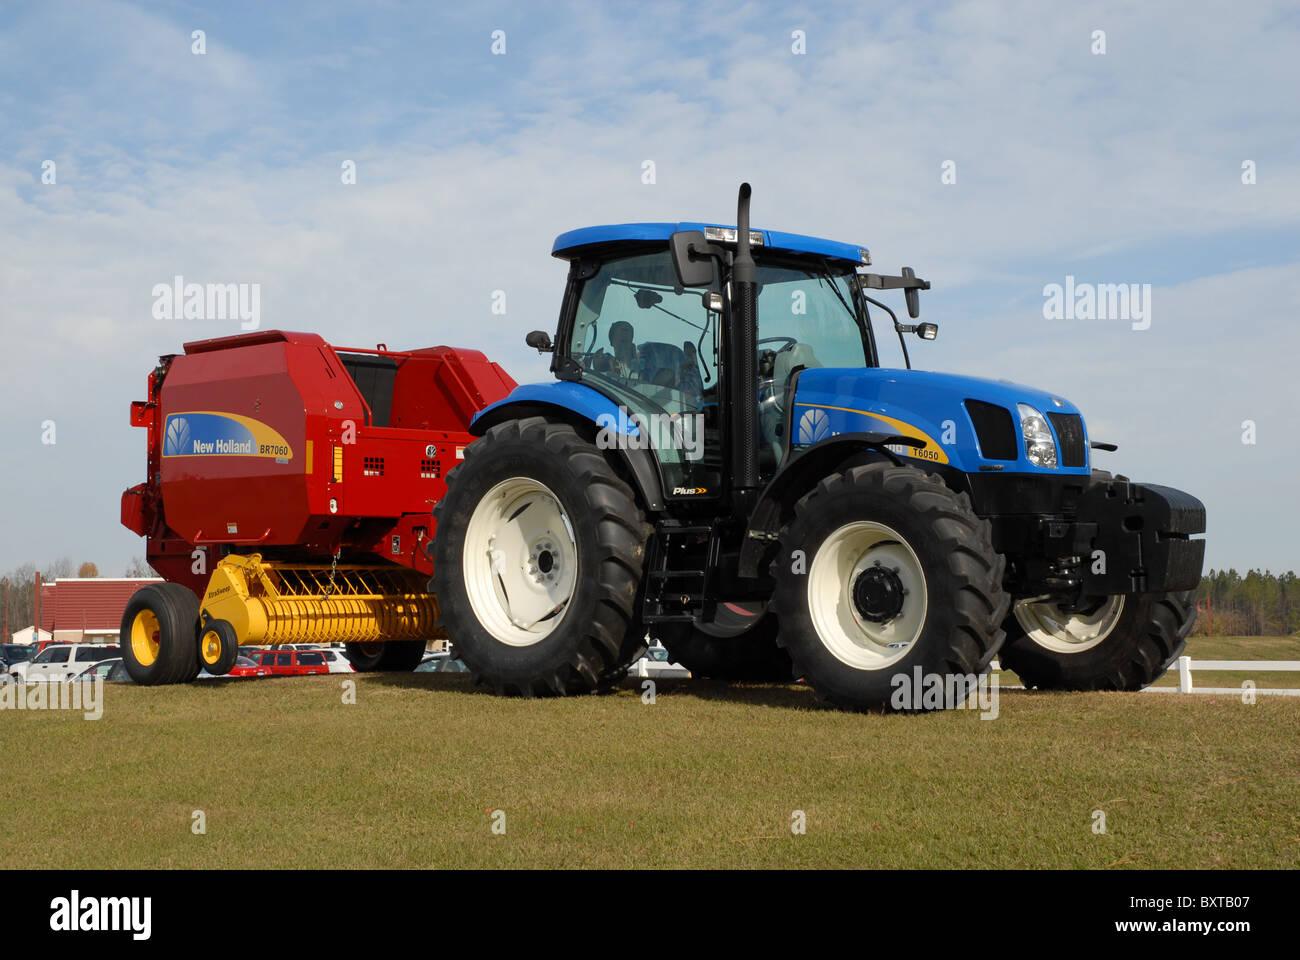 New Holland Farm Tractor Stockfotos & New Holland Farm Tractor ...